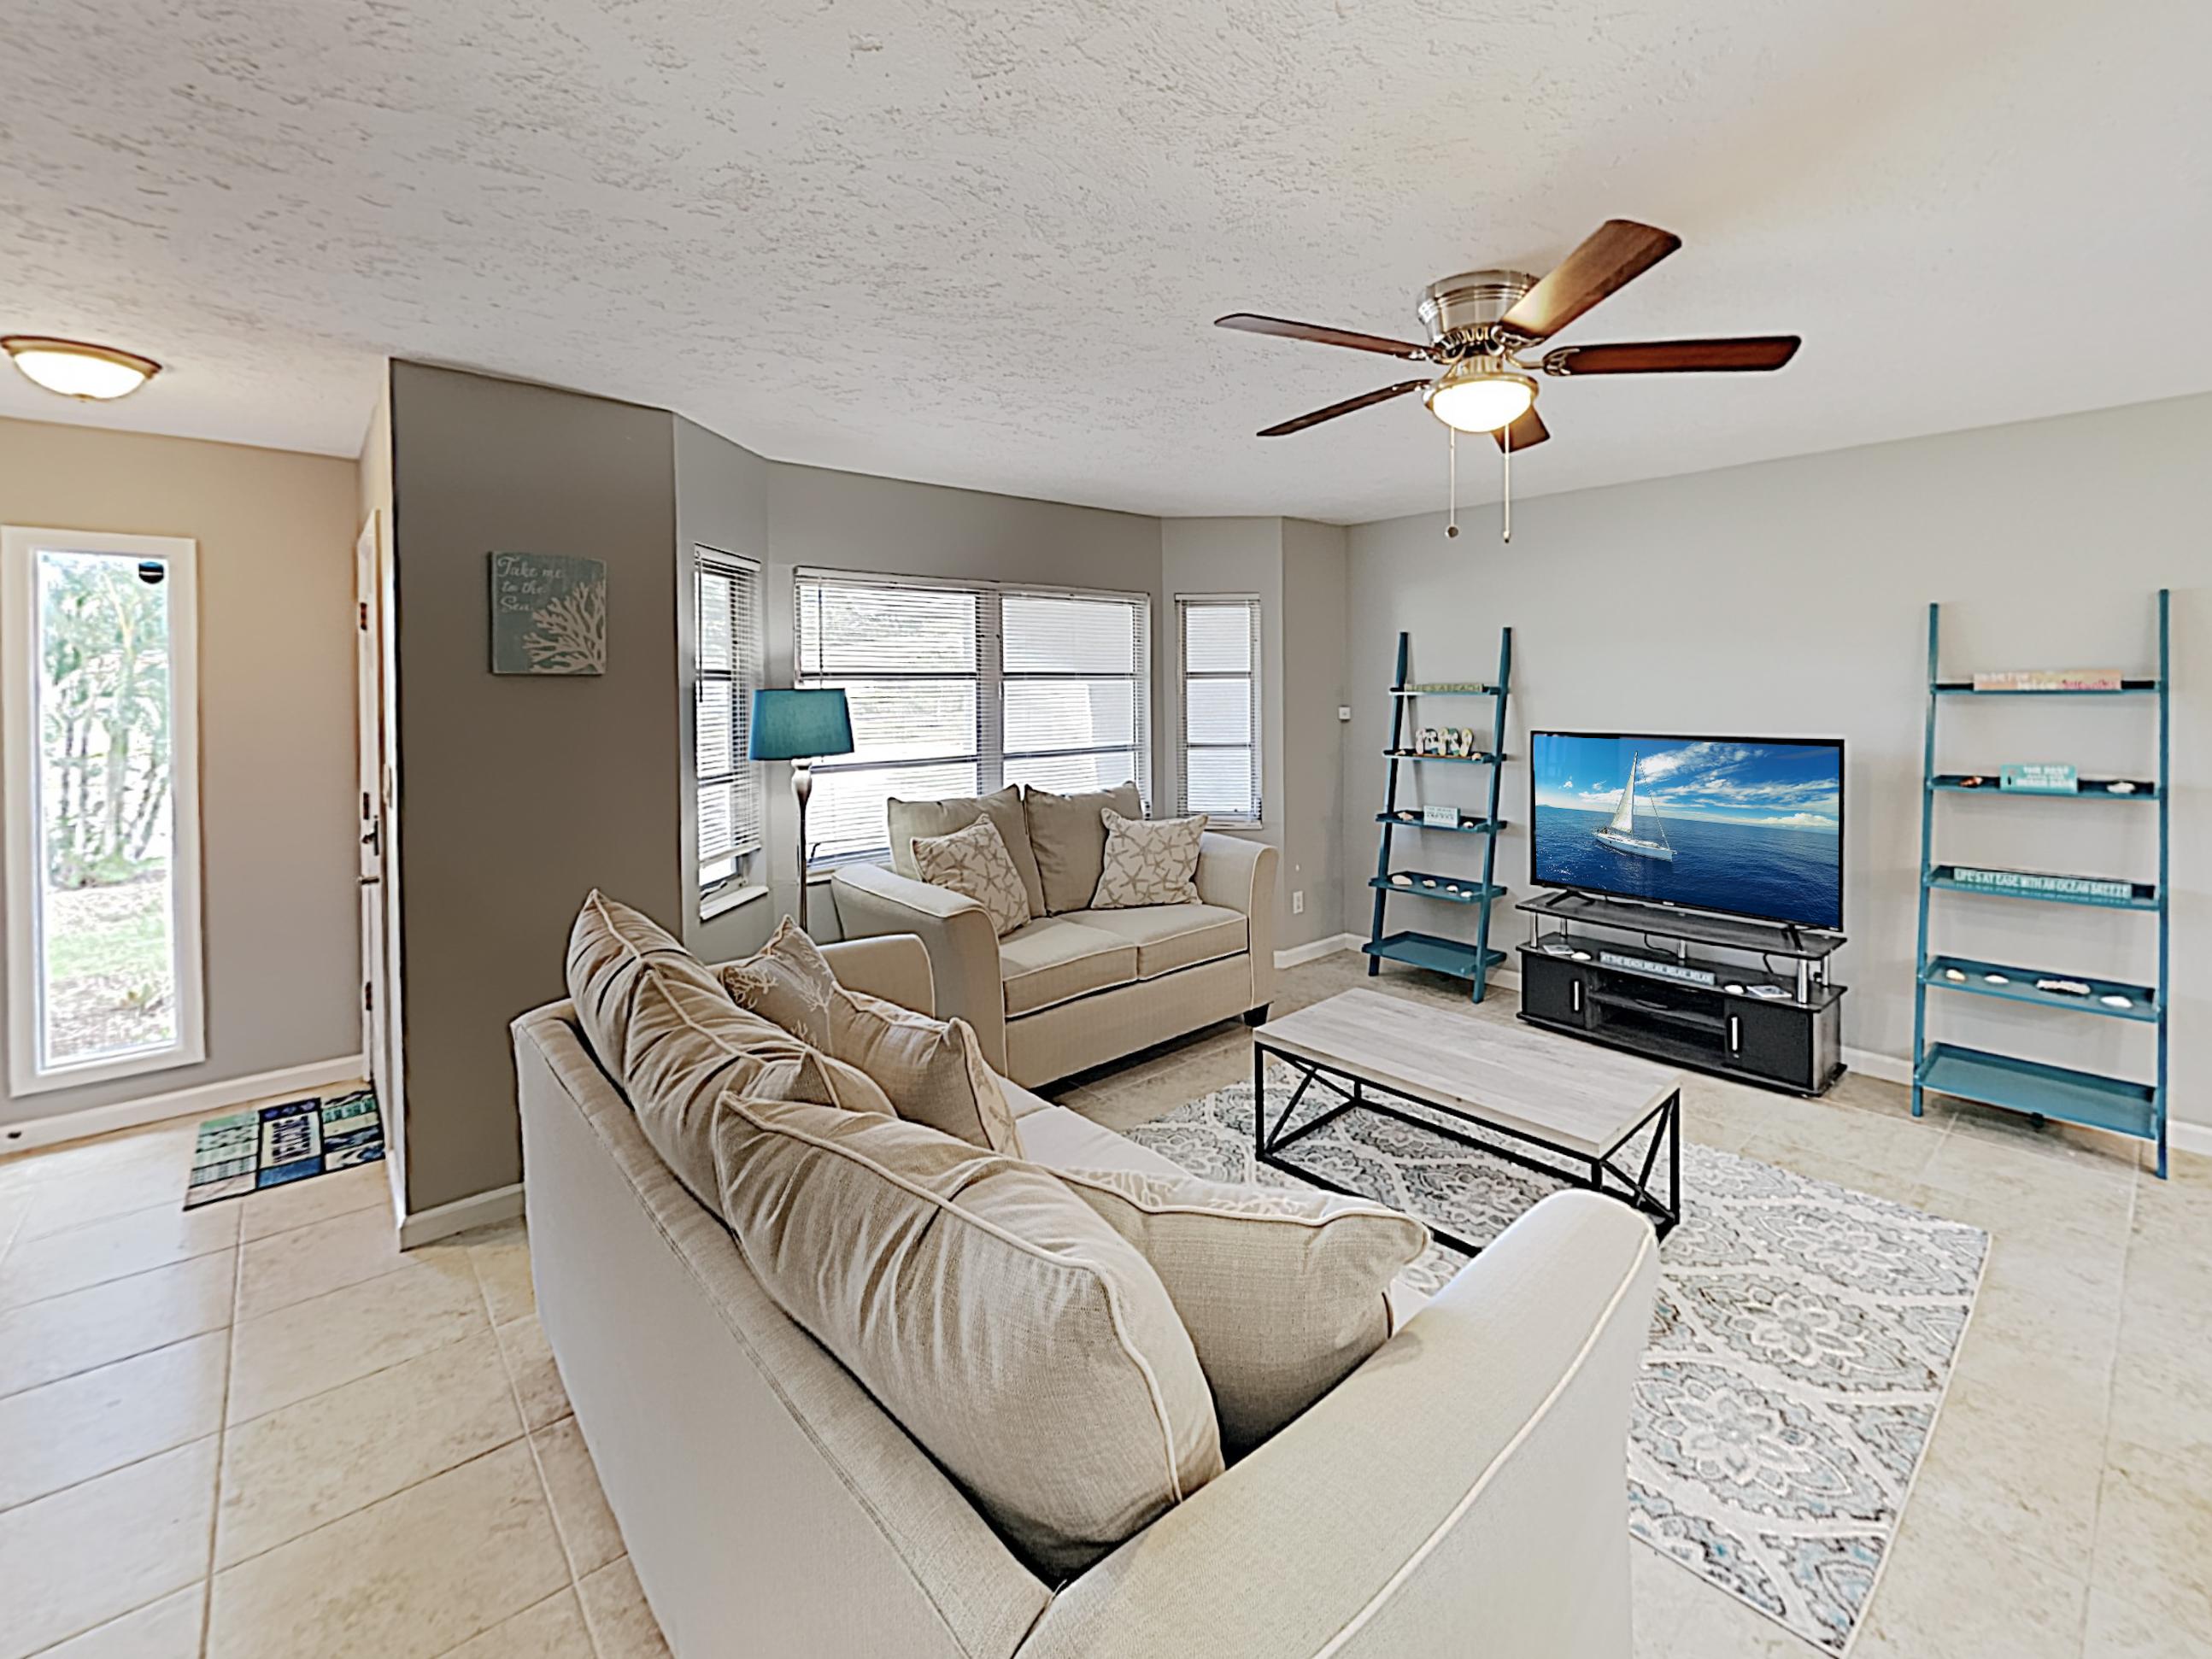 Sarasota FL Vacation Rental Welcome to Gulf